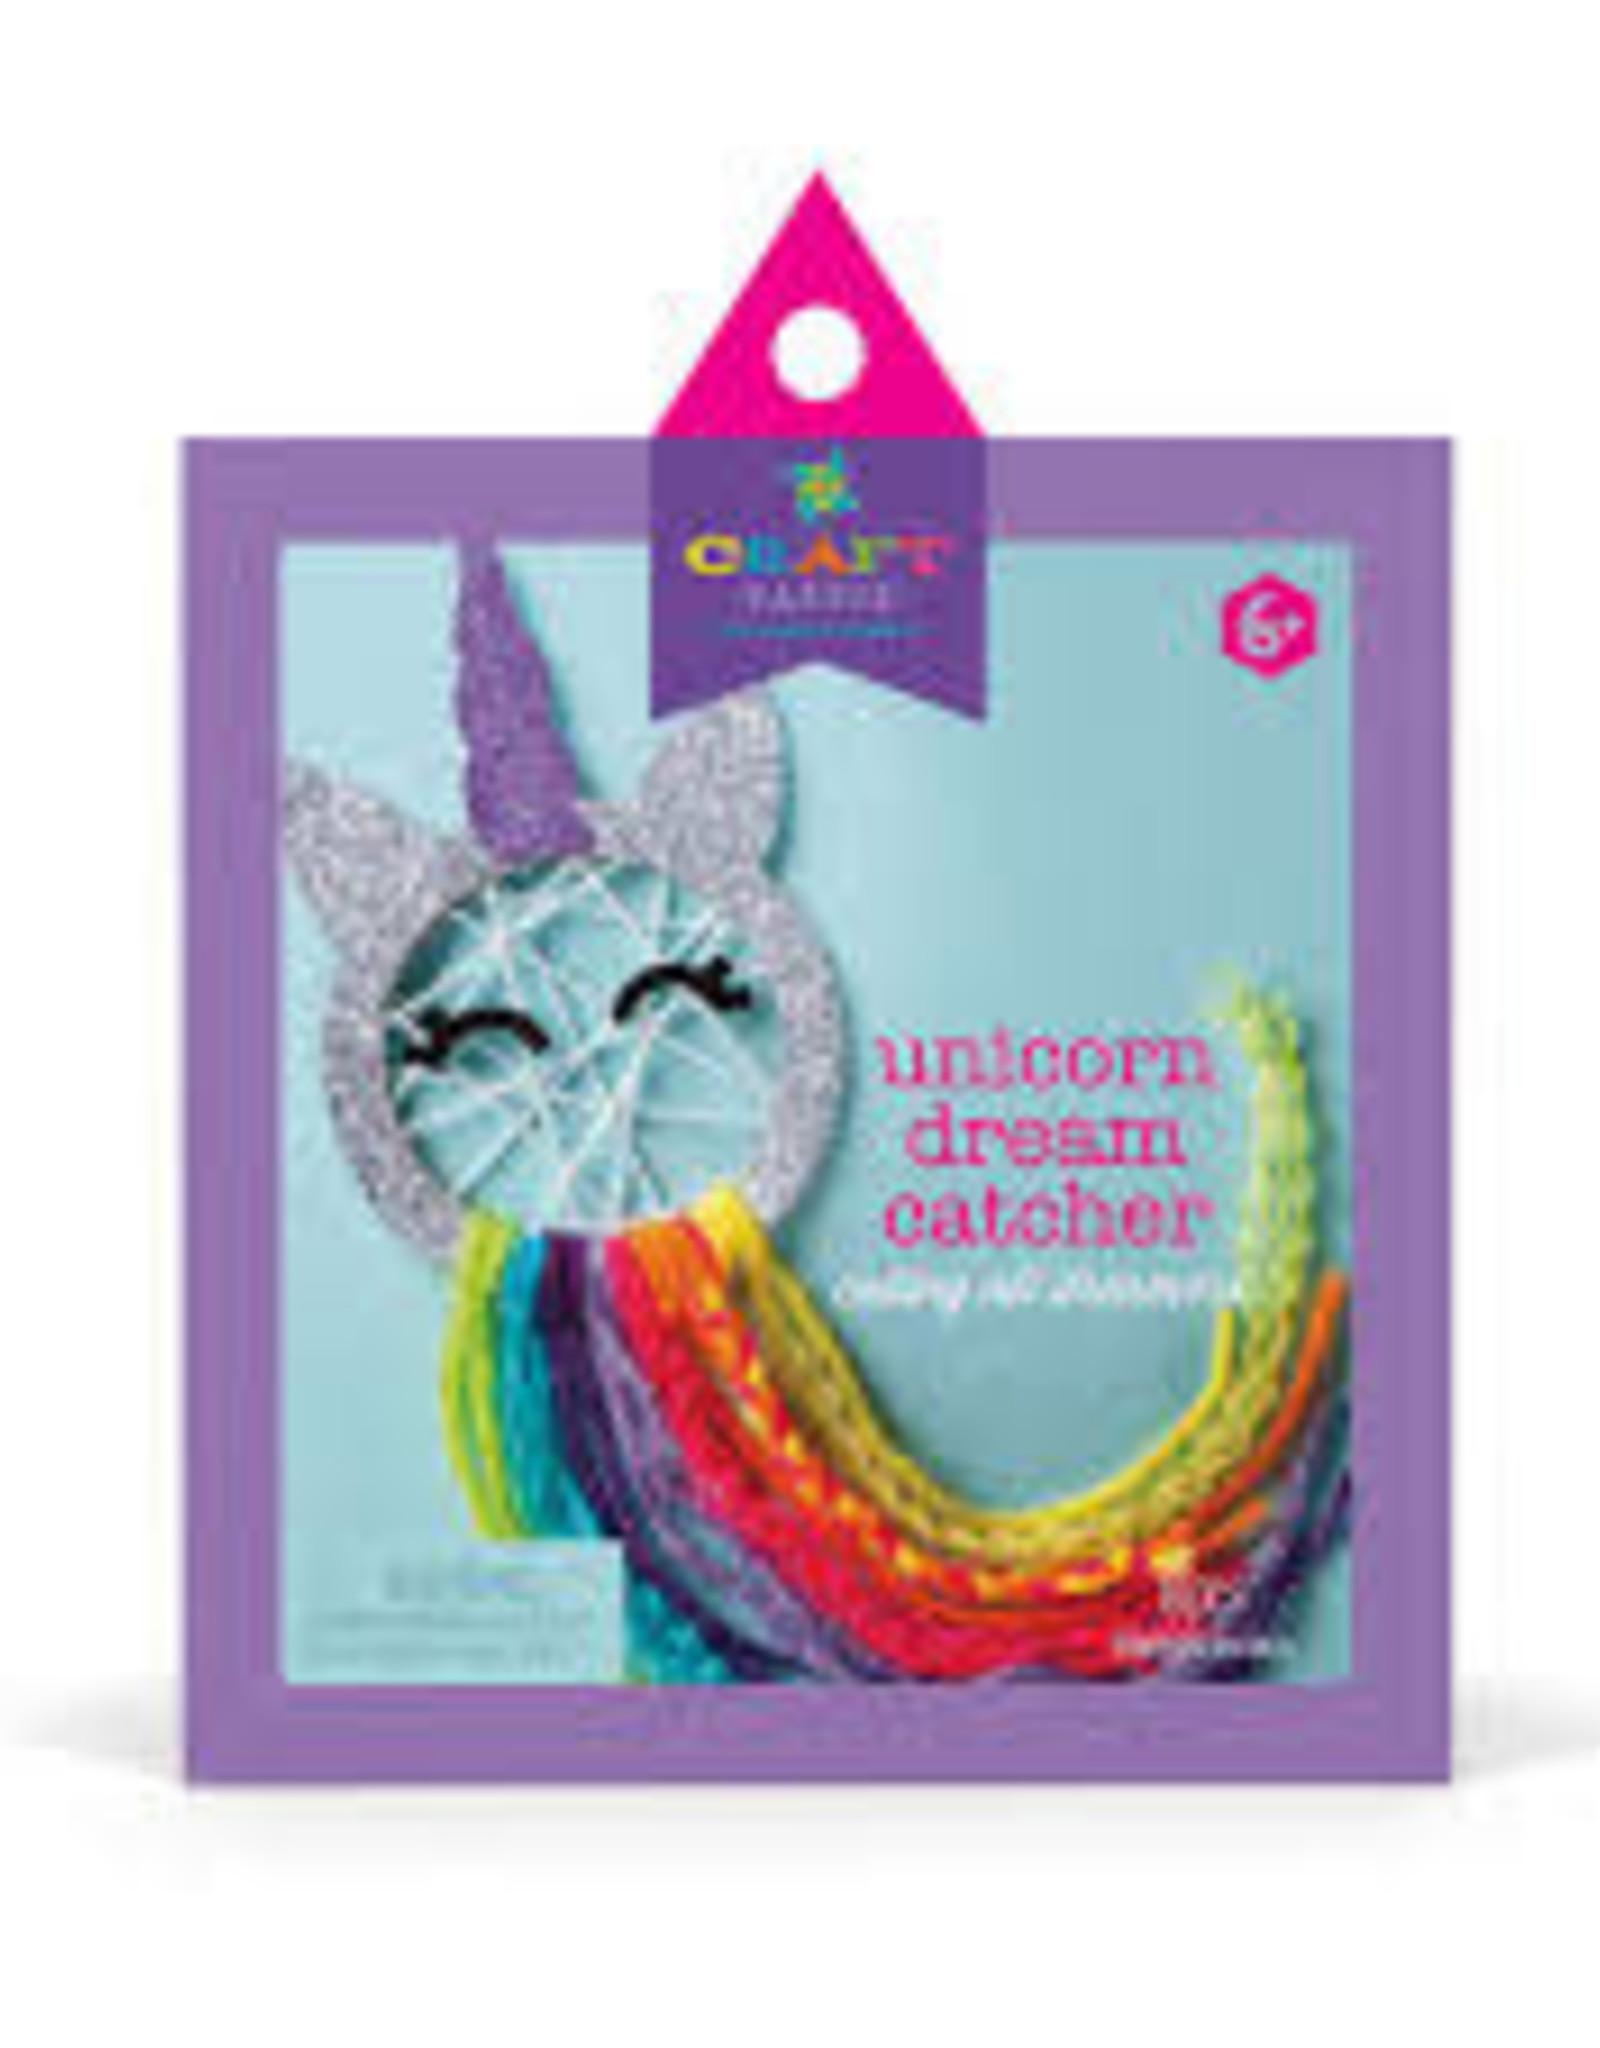 Ann Williams Unicorn Dream Catcher